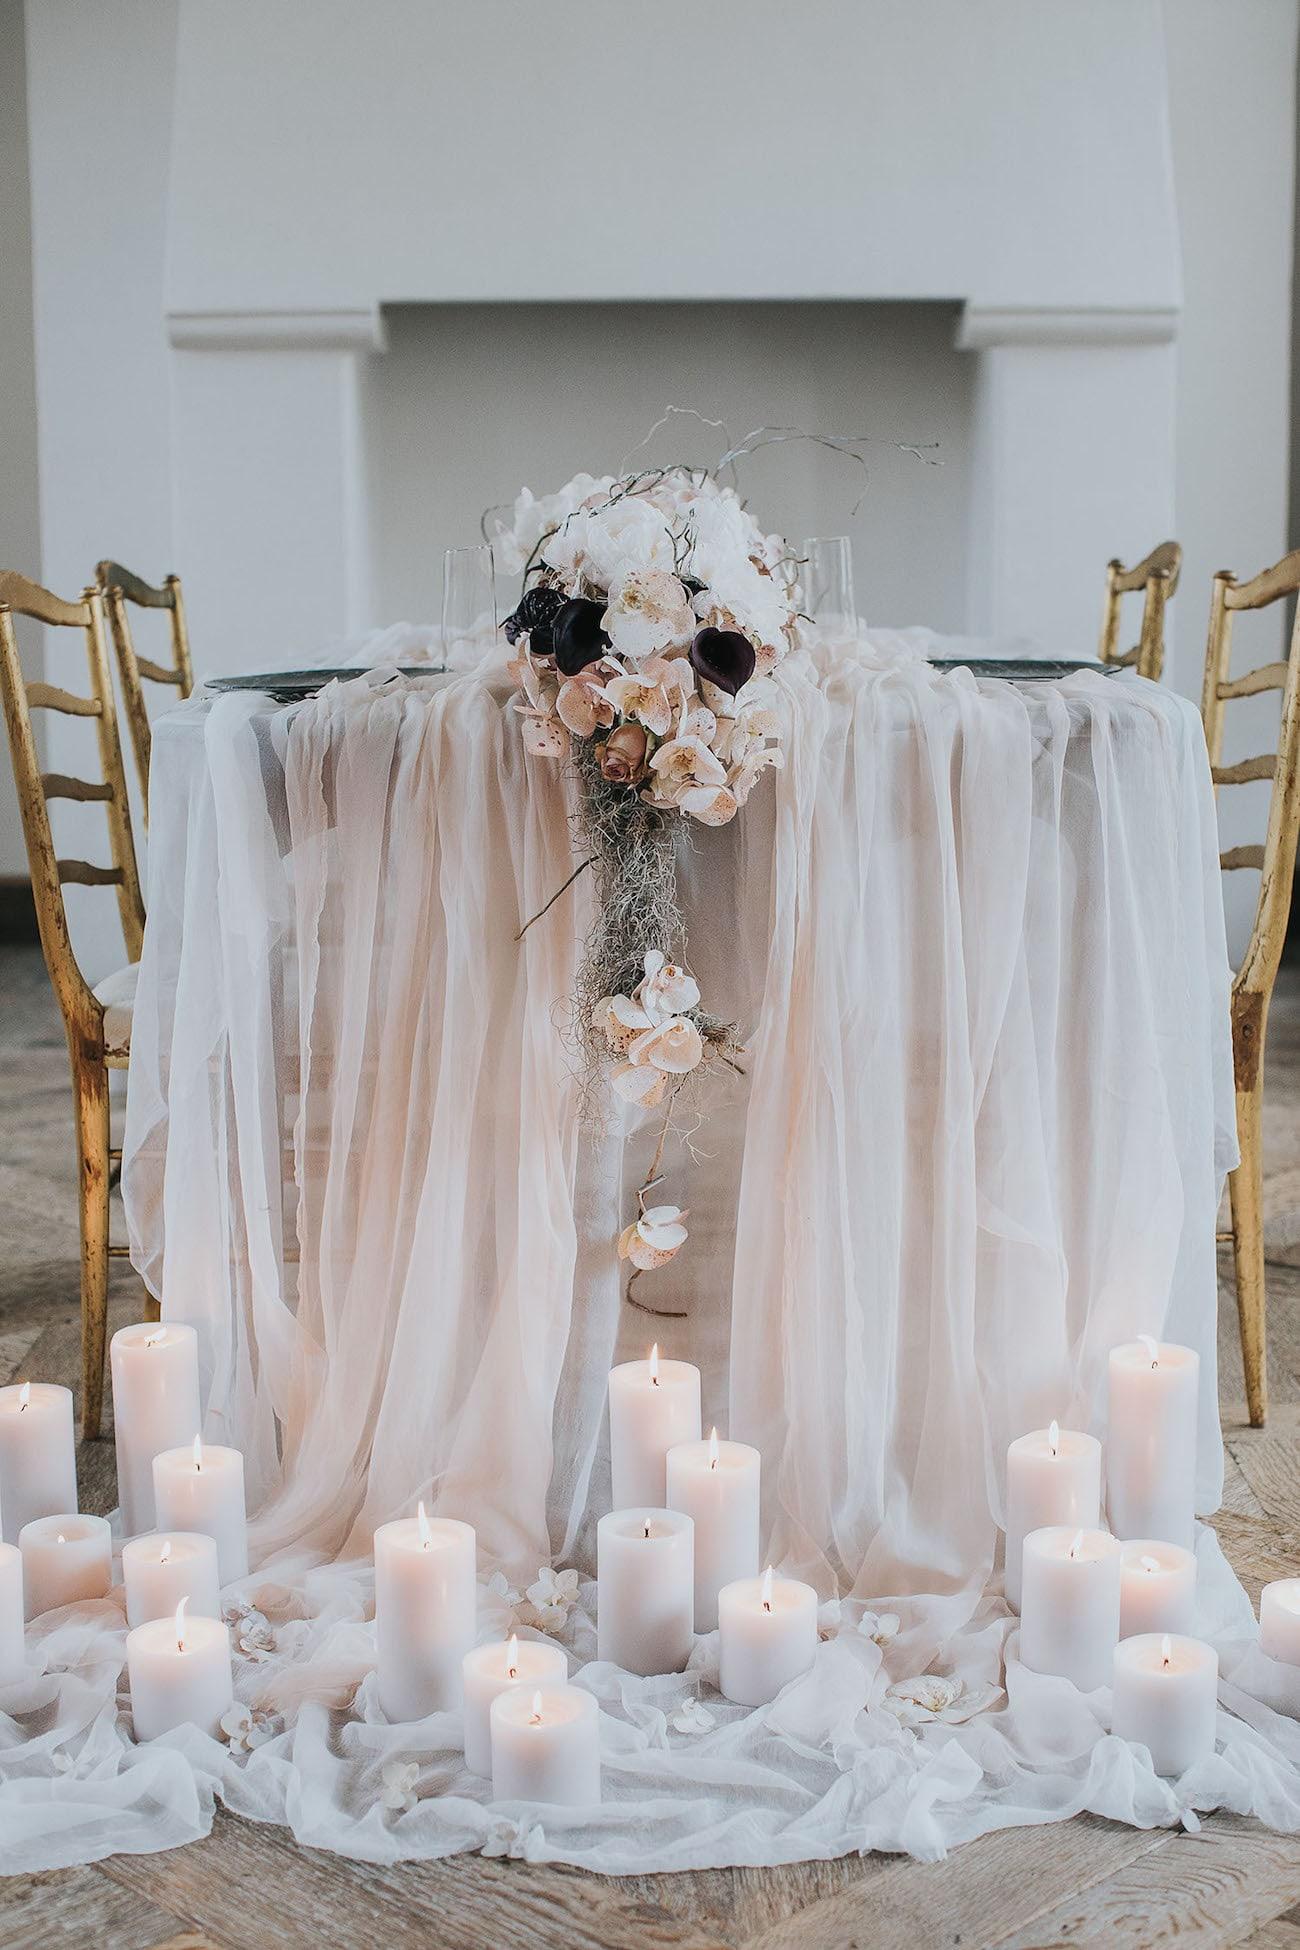 Romantic Wedding Decor | Credit: Cornelia Lietz